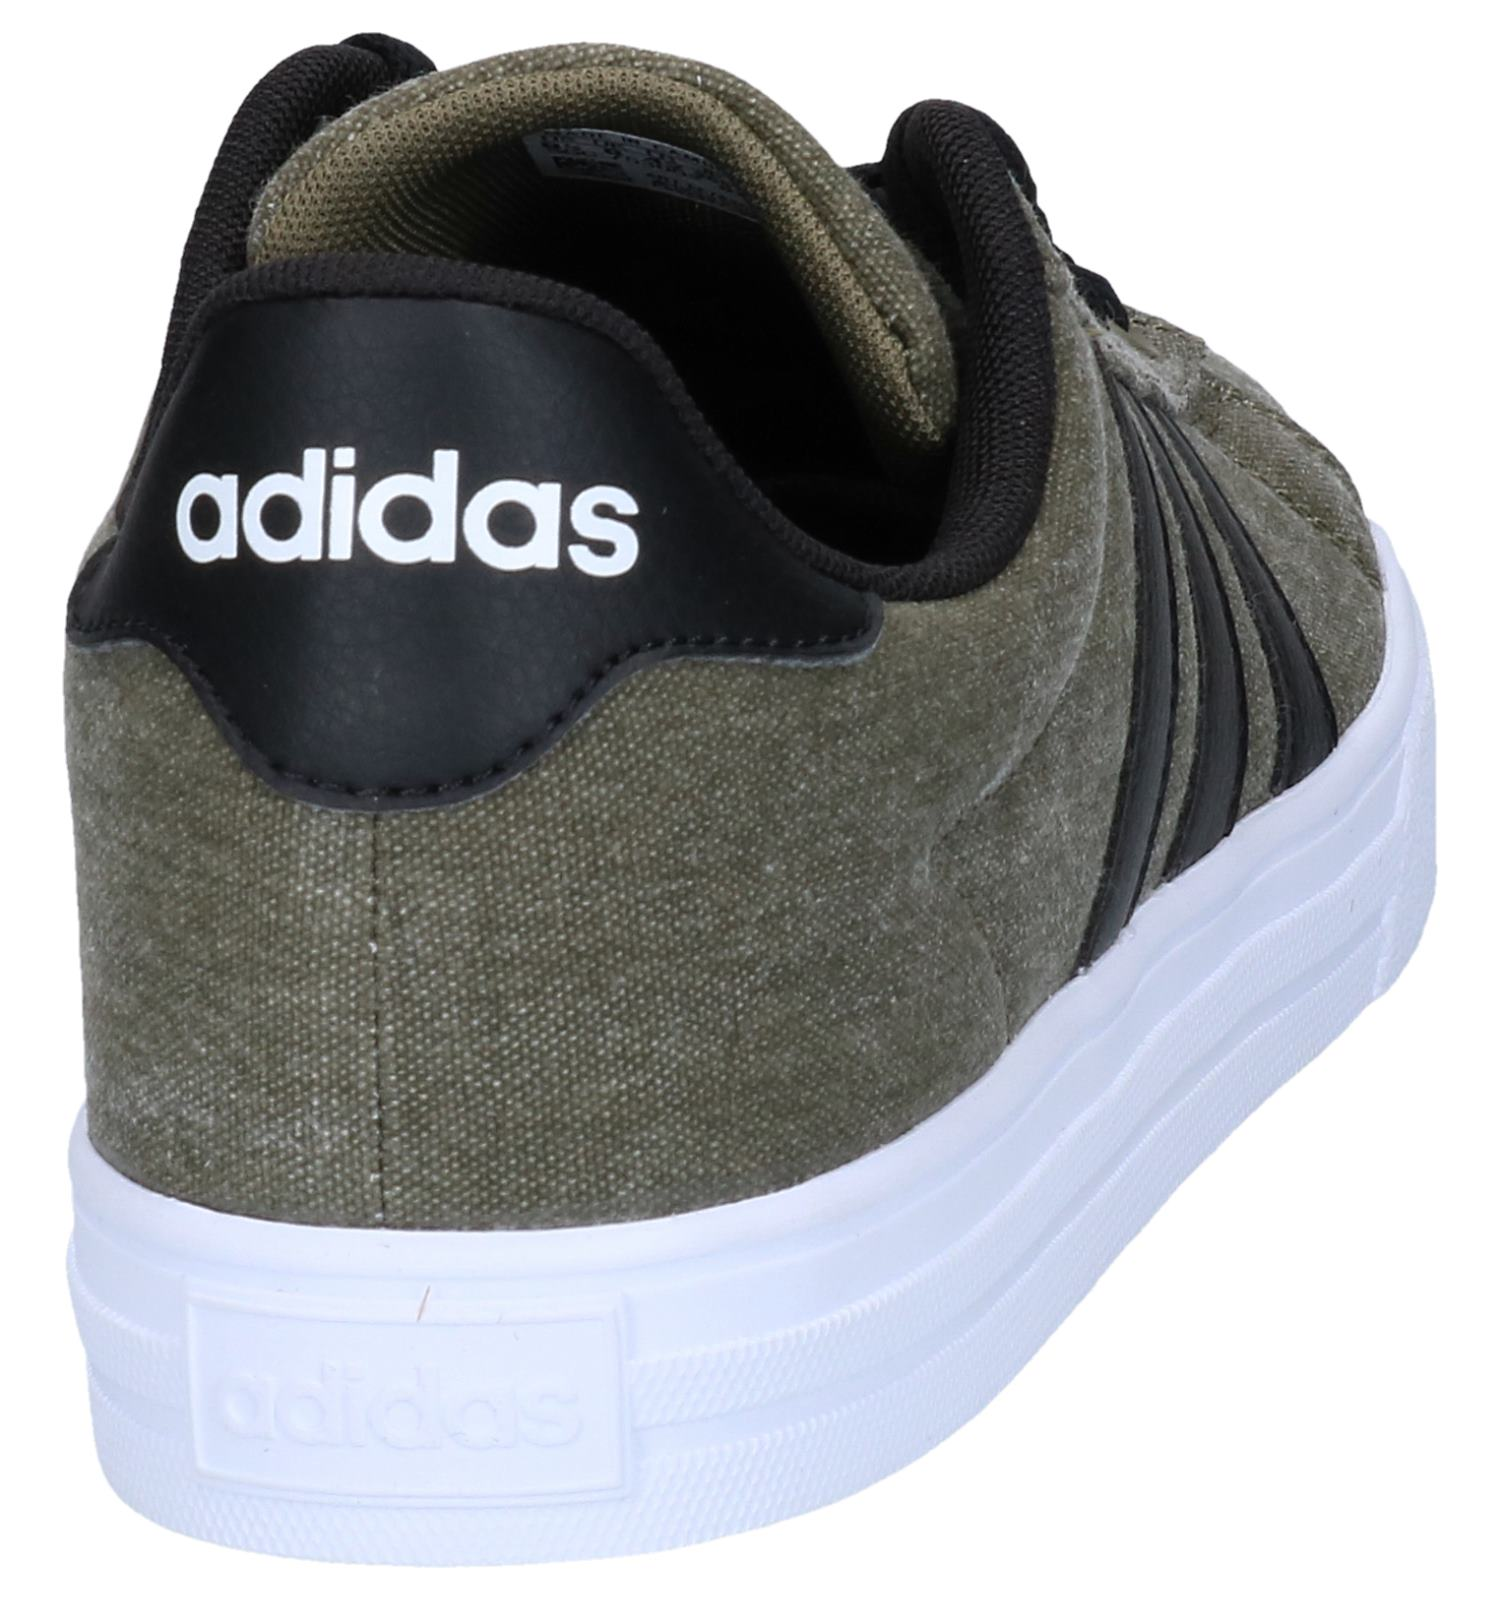 Kaki adidas Daily 2.0 Sneakers | SCHOENENTORFS.NL | Gratis